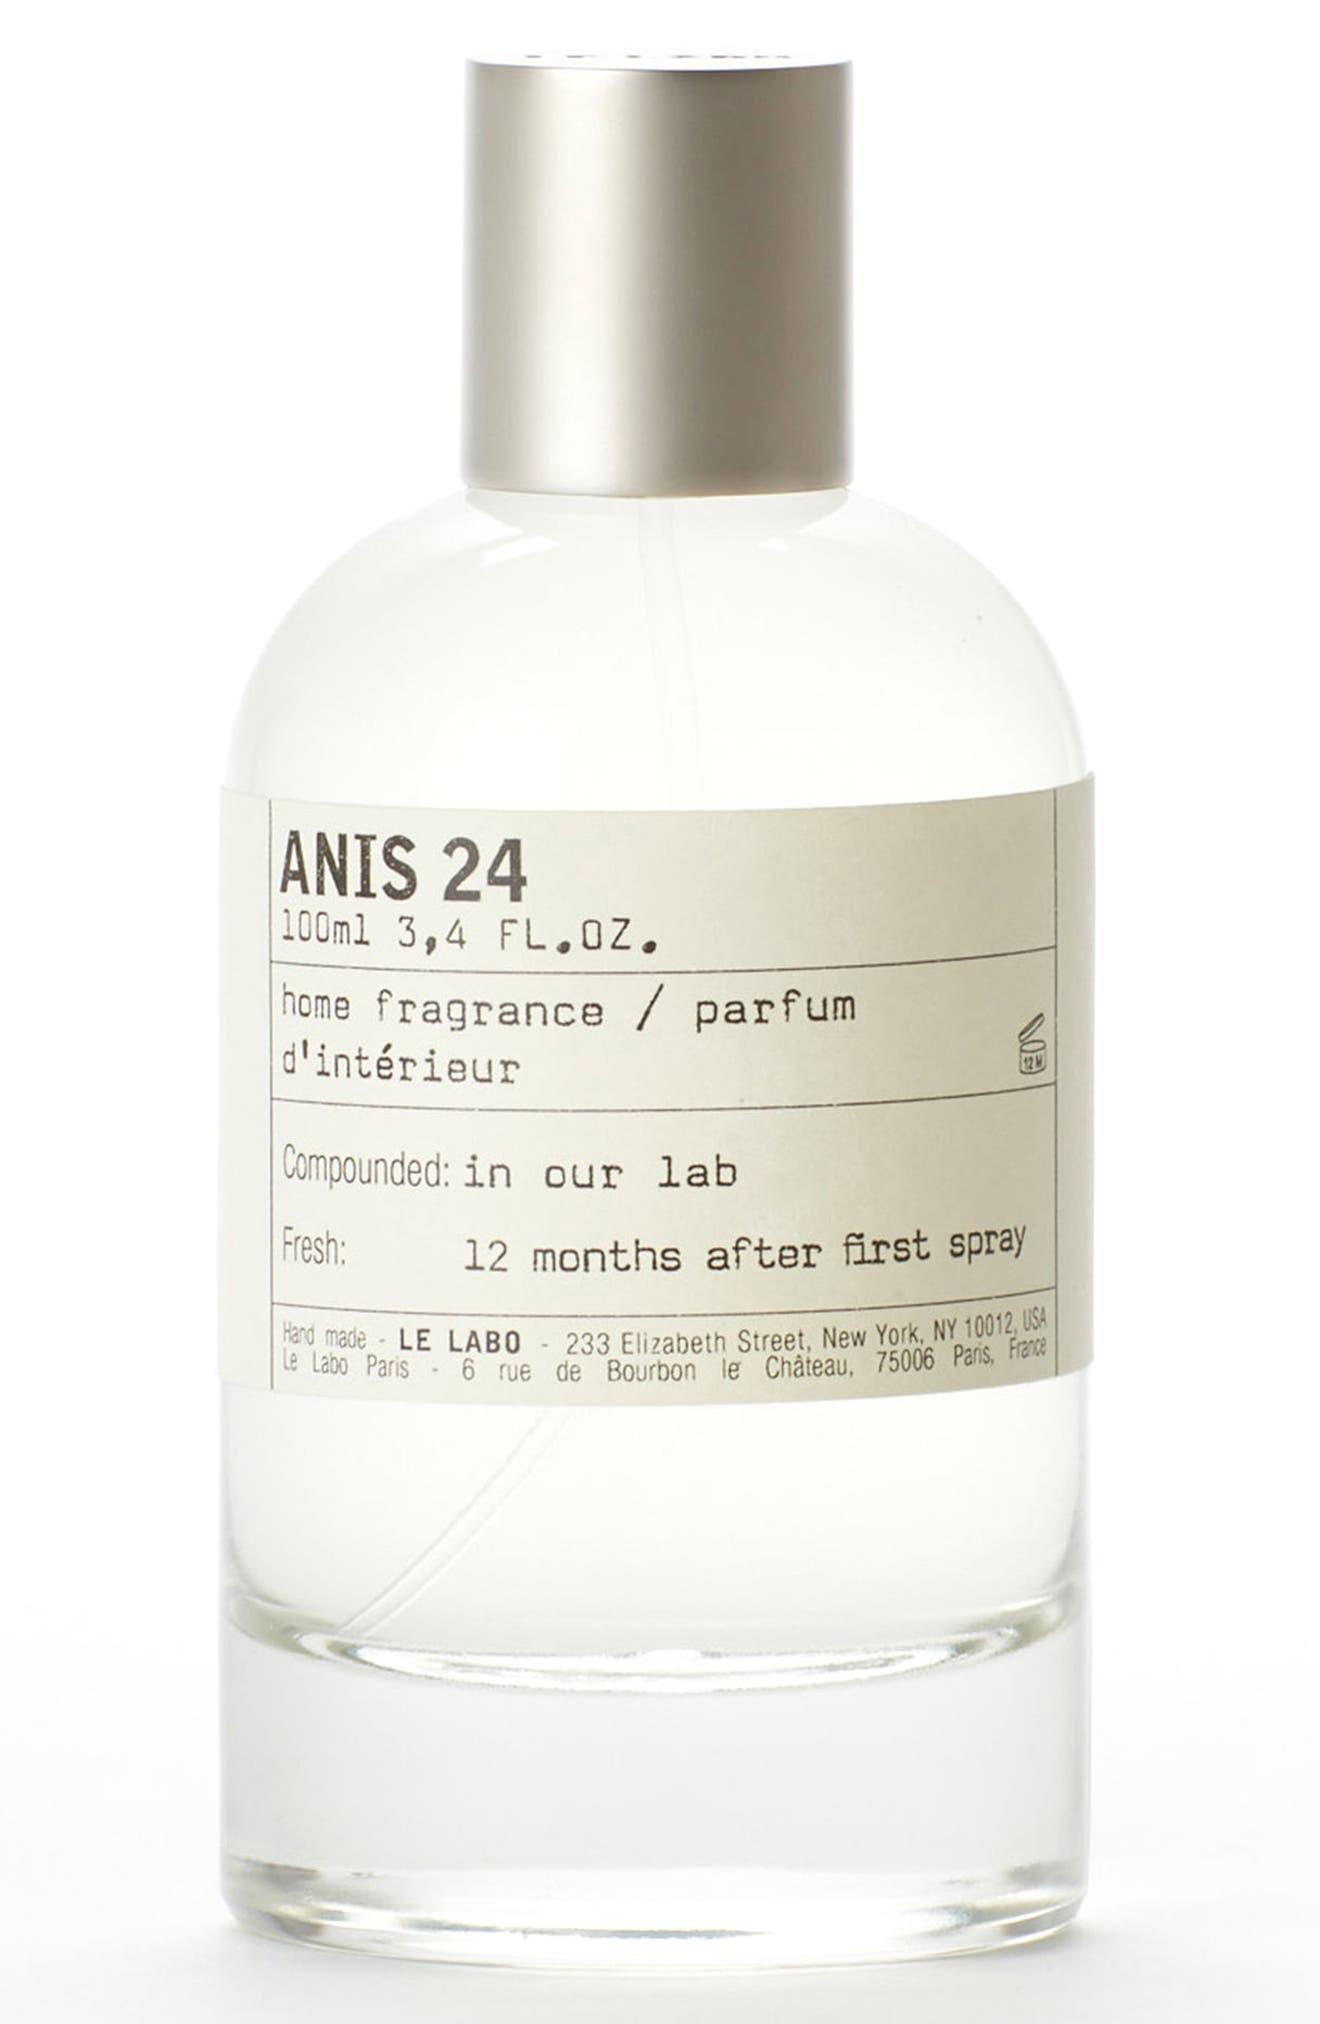 Alternate Image 1 Selected - Le Labo 'Anis 24' Home Fragrance Spray